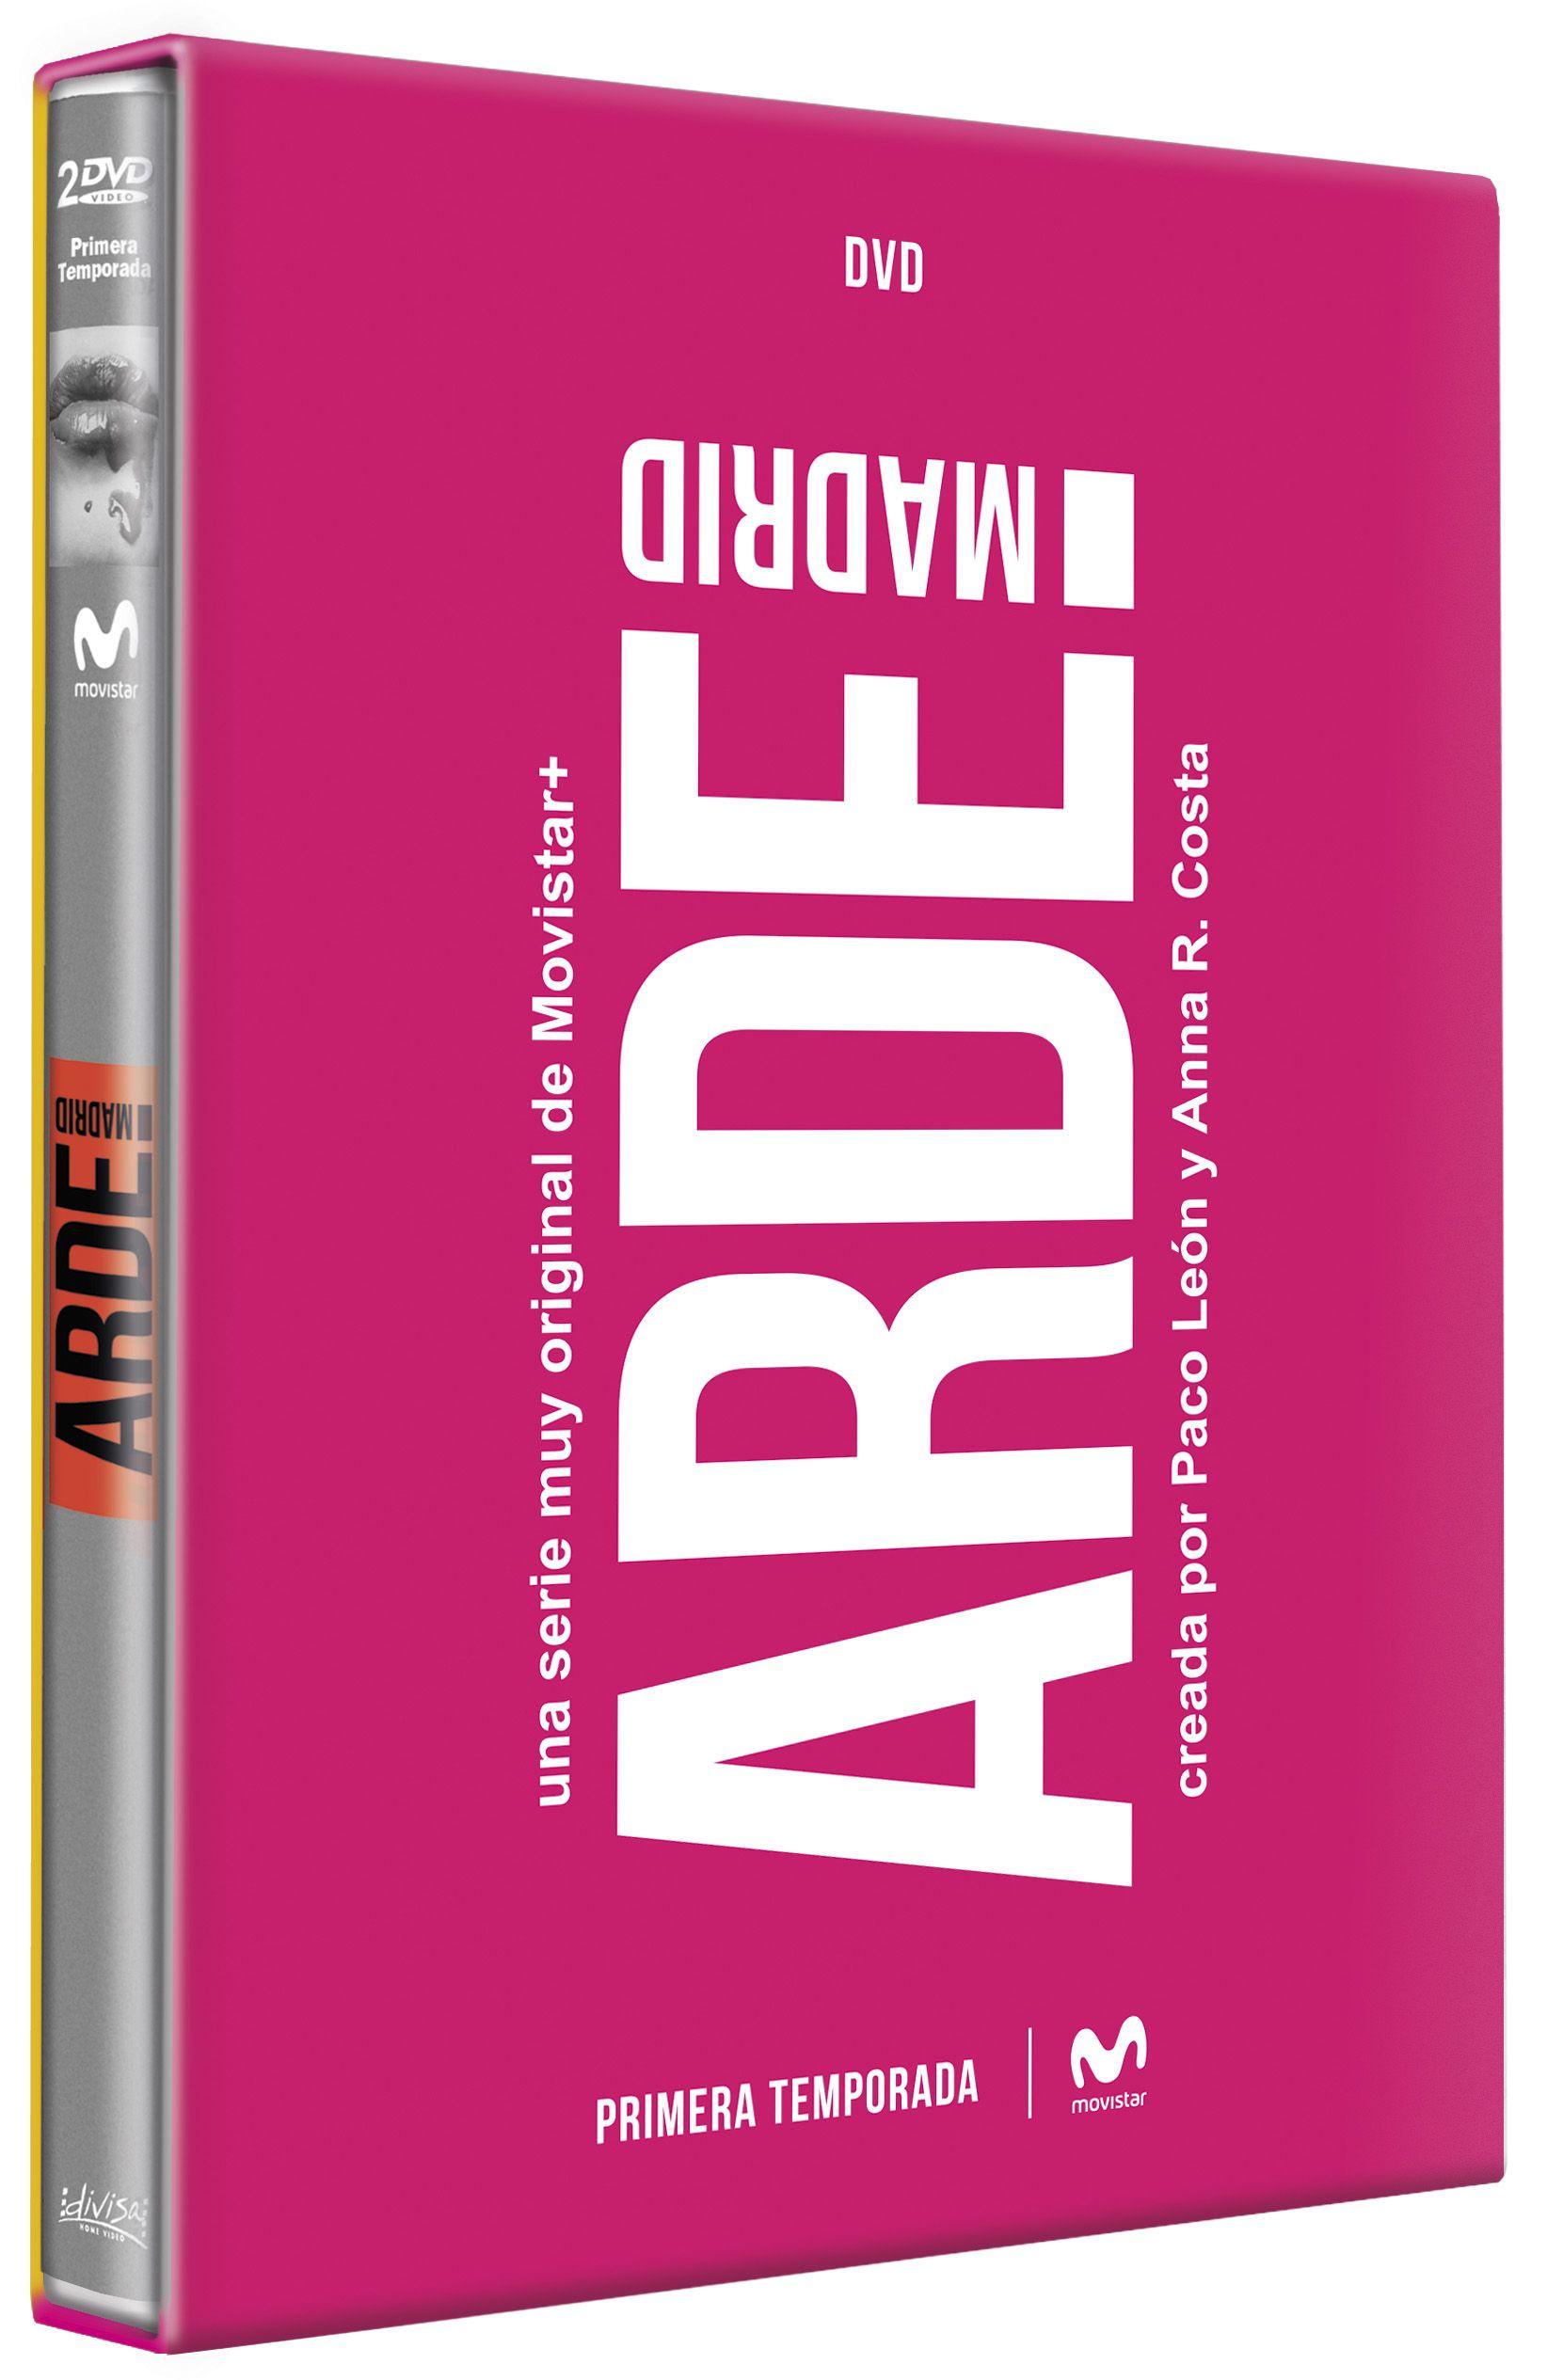 arde madrid - dvd - temporada 1-8421394552135